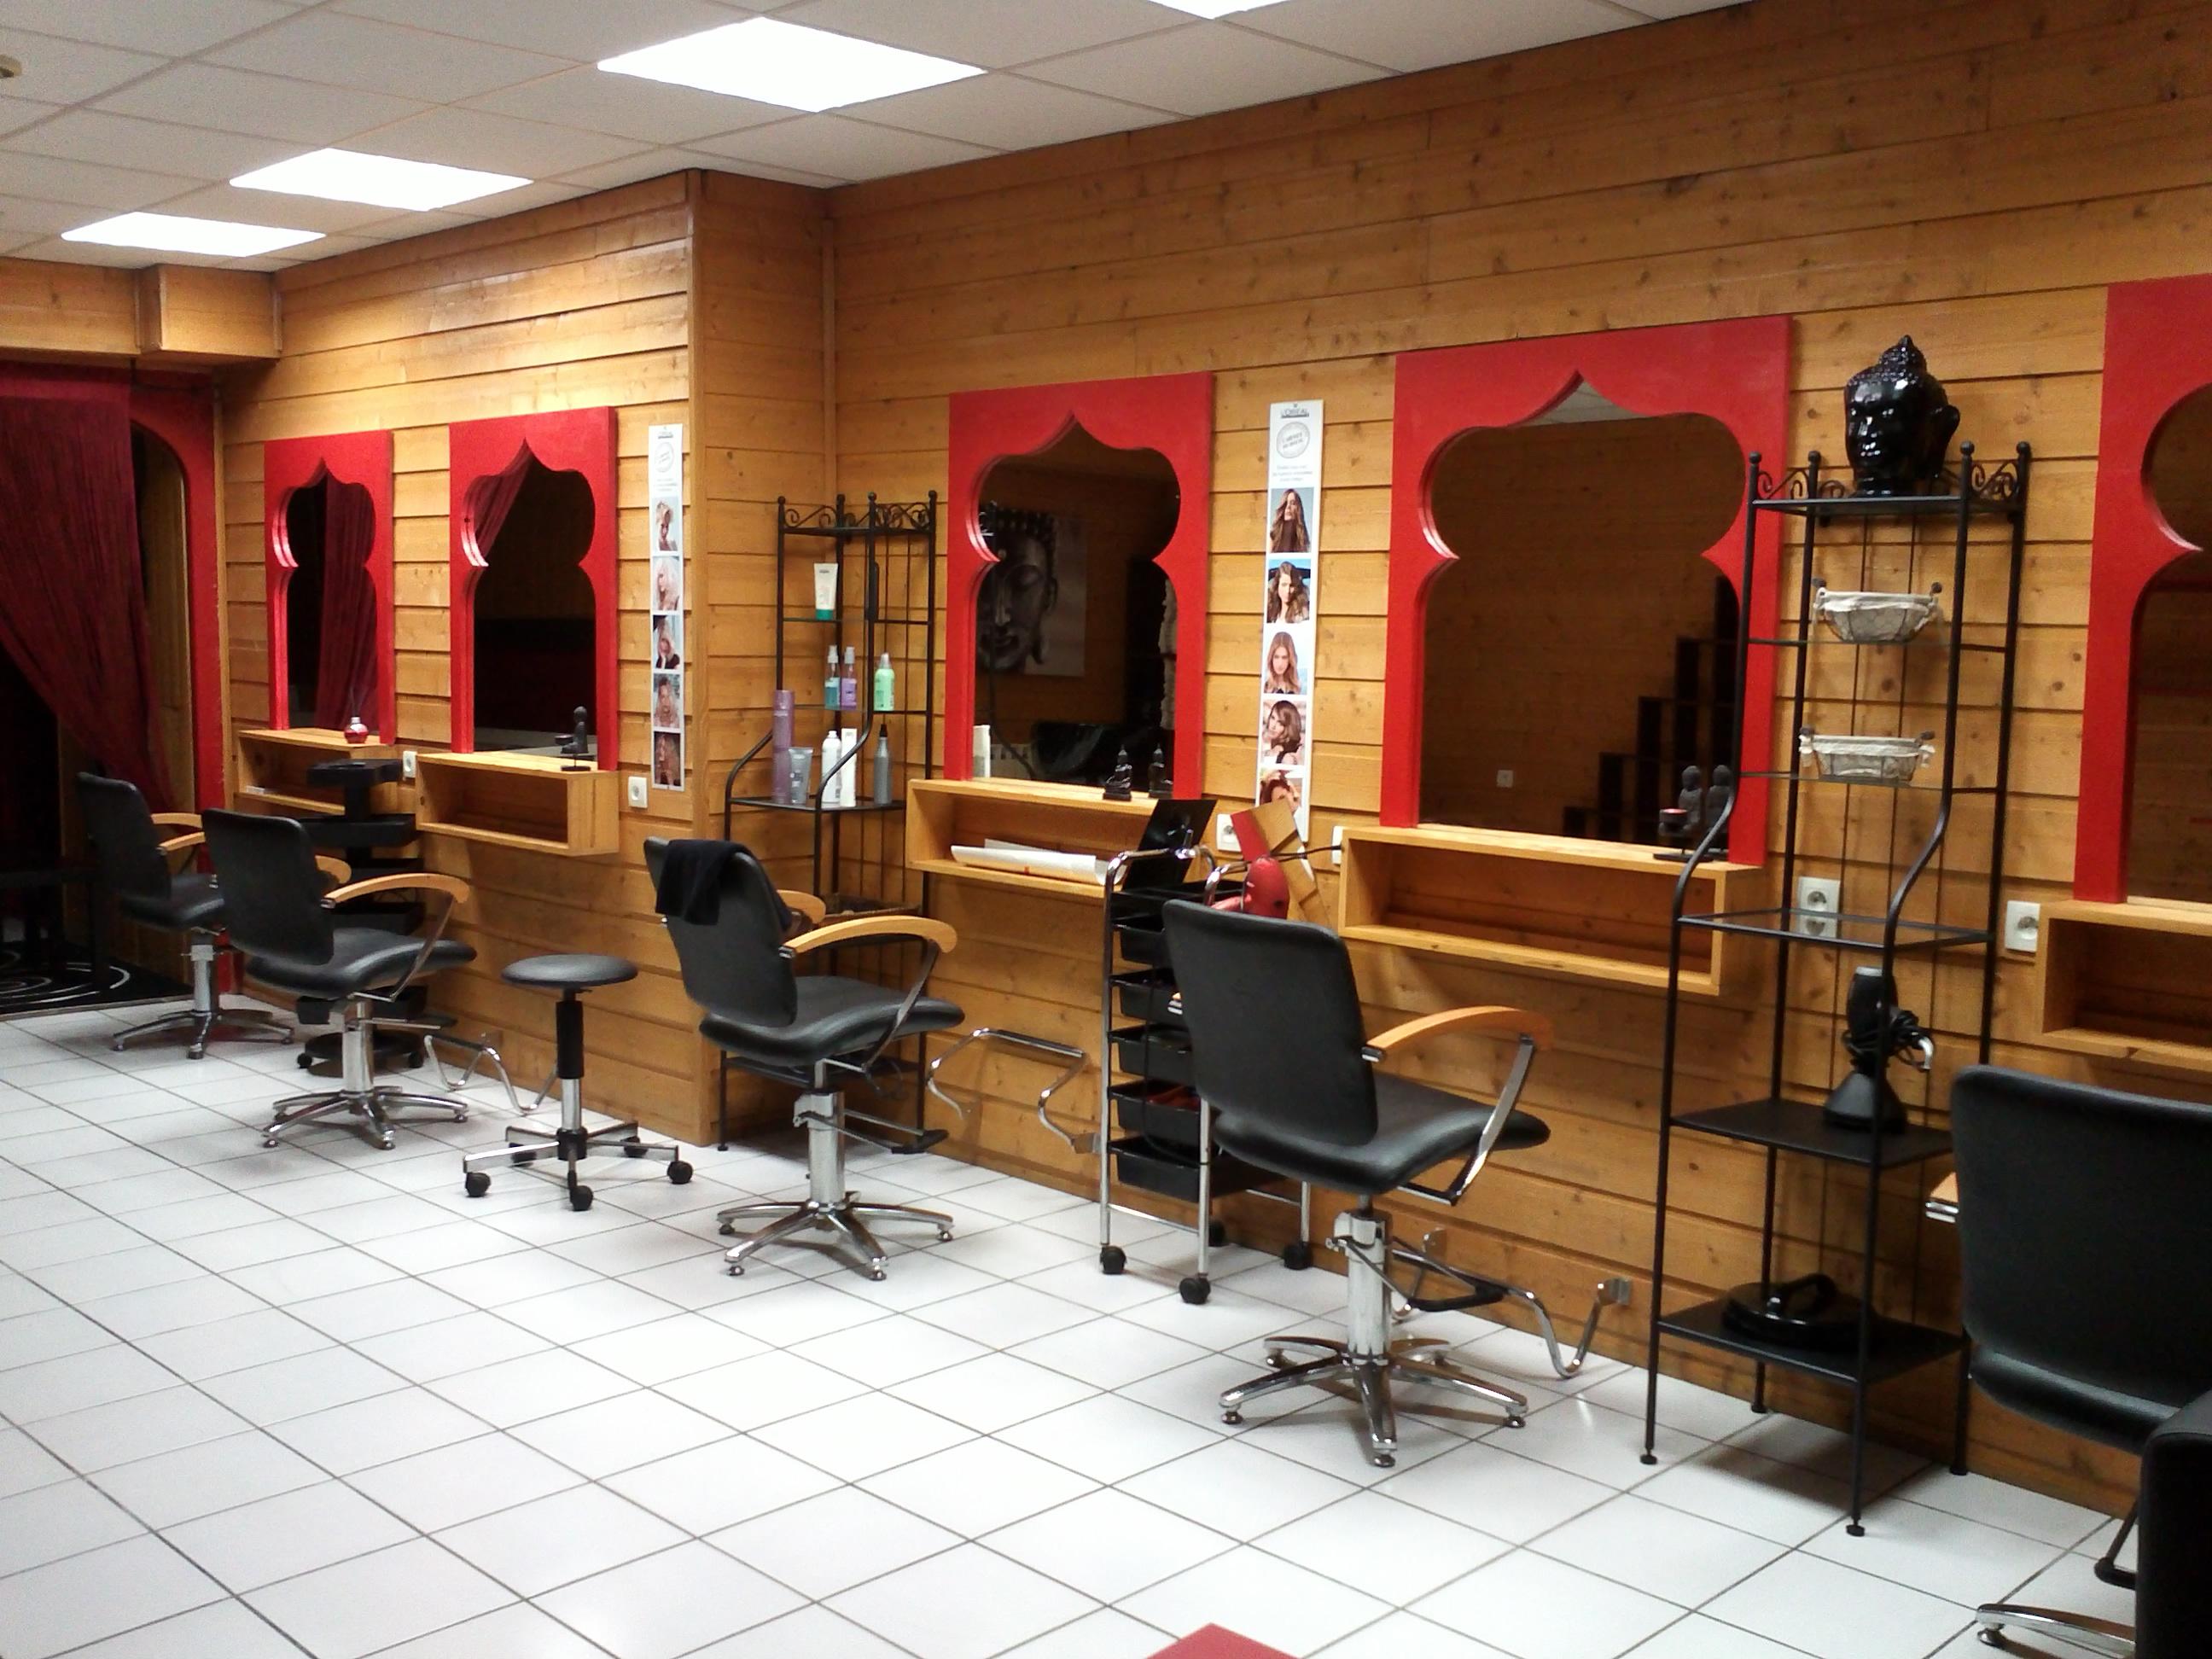 Salon de Coiffure Saraswatie